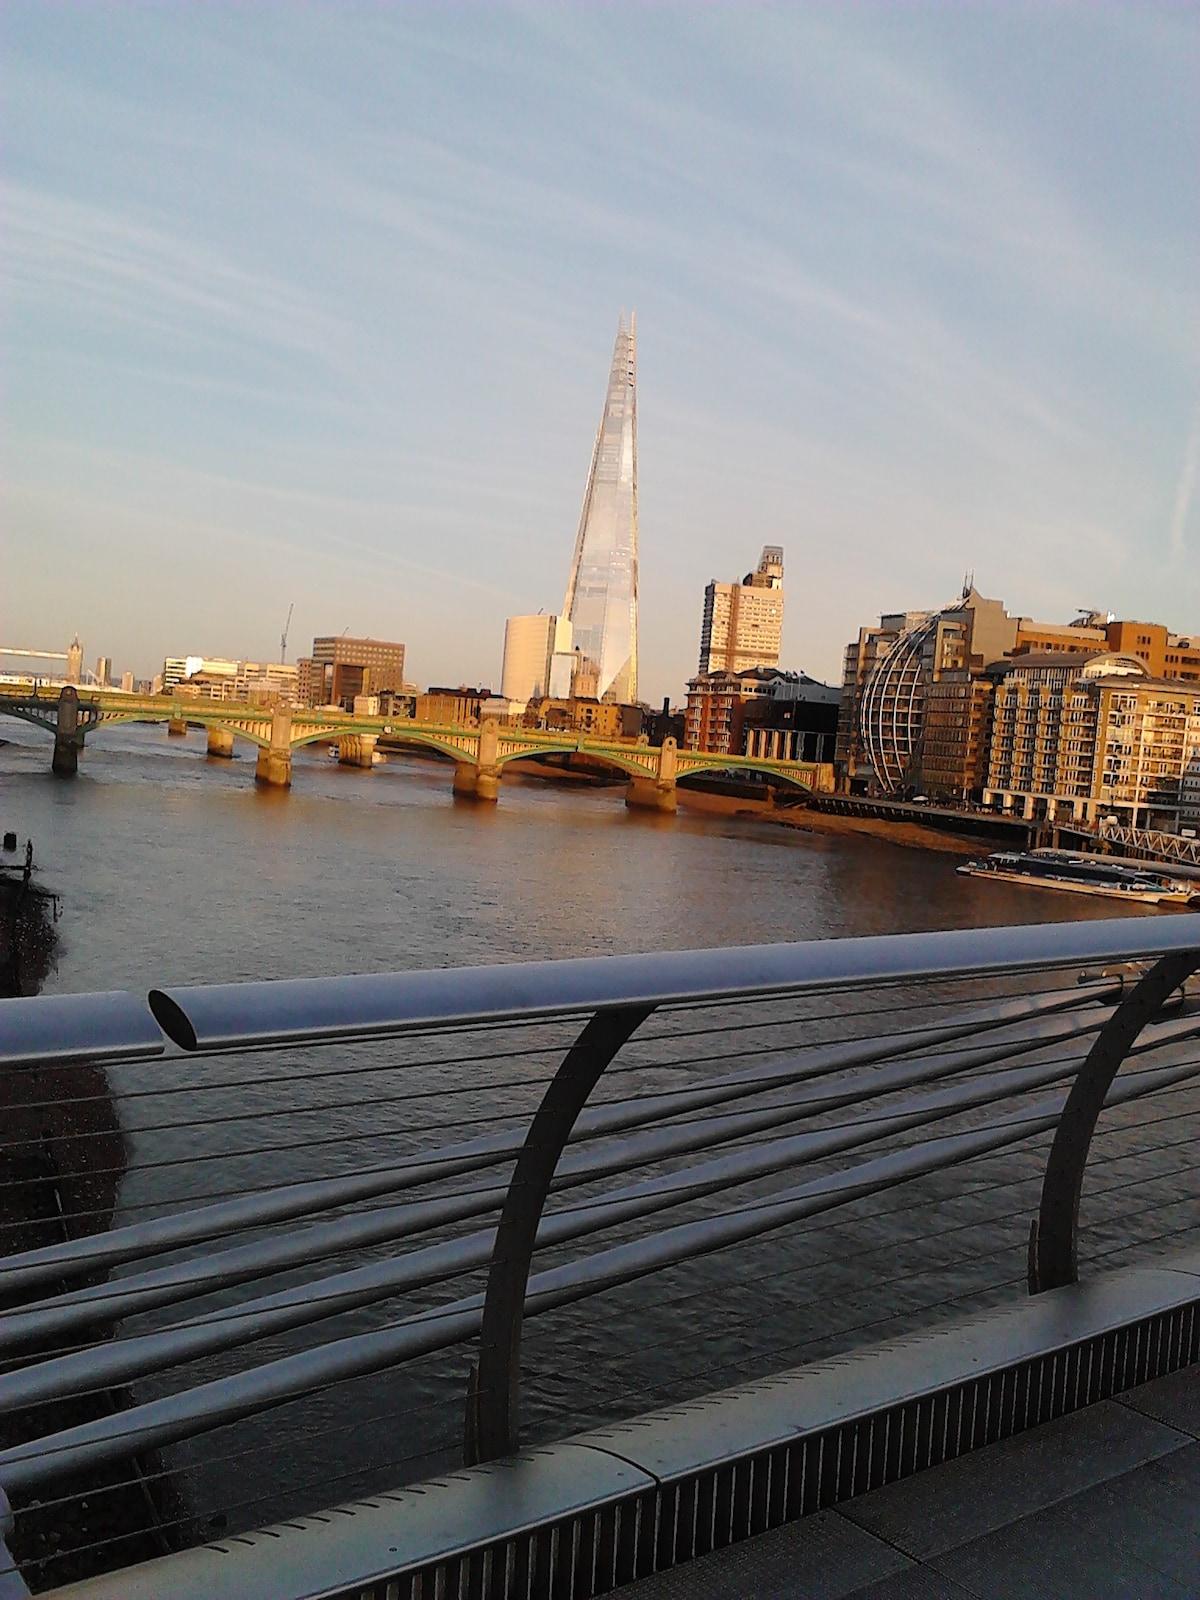 Sunny from London